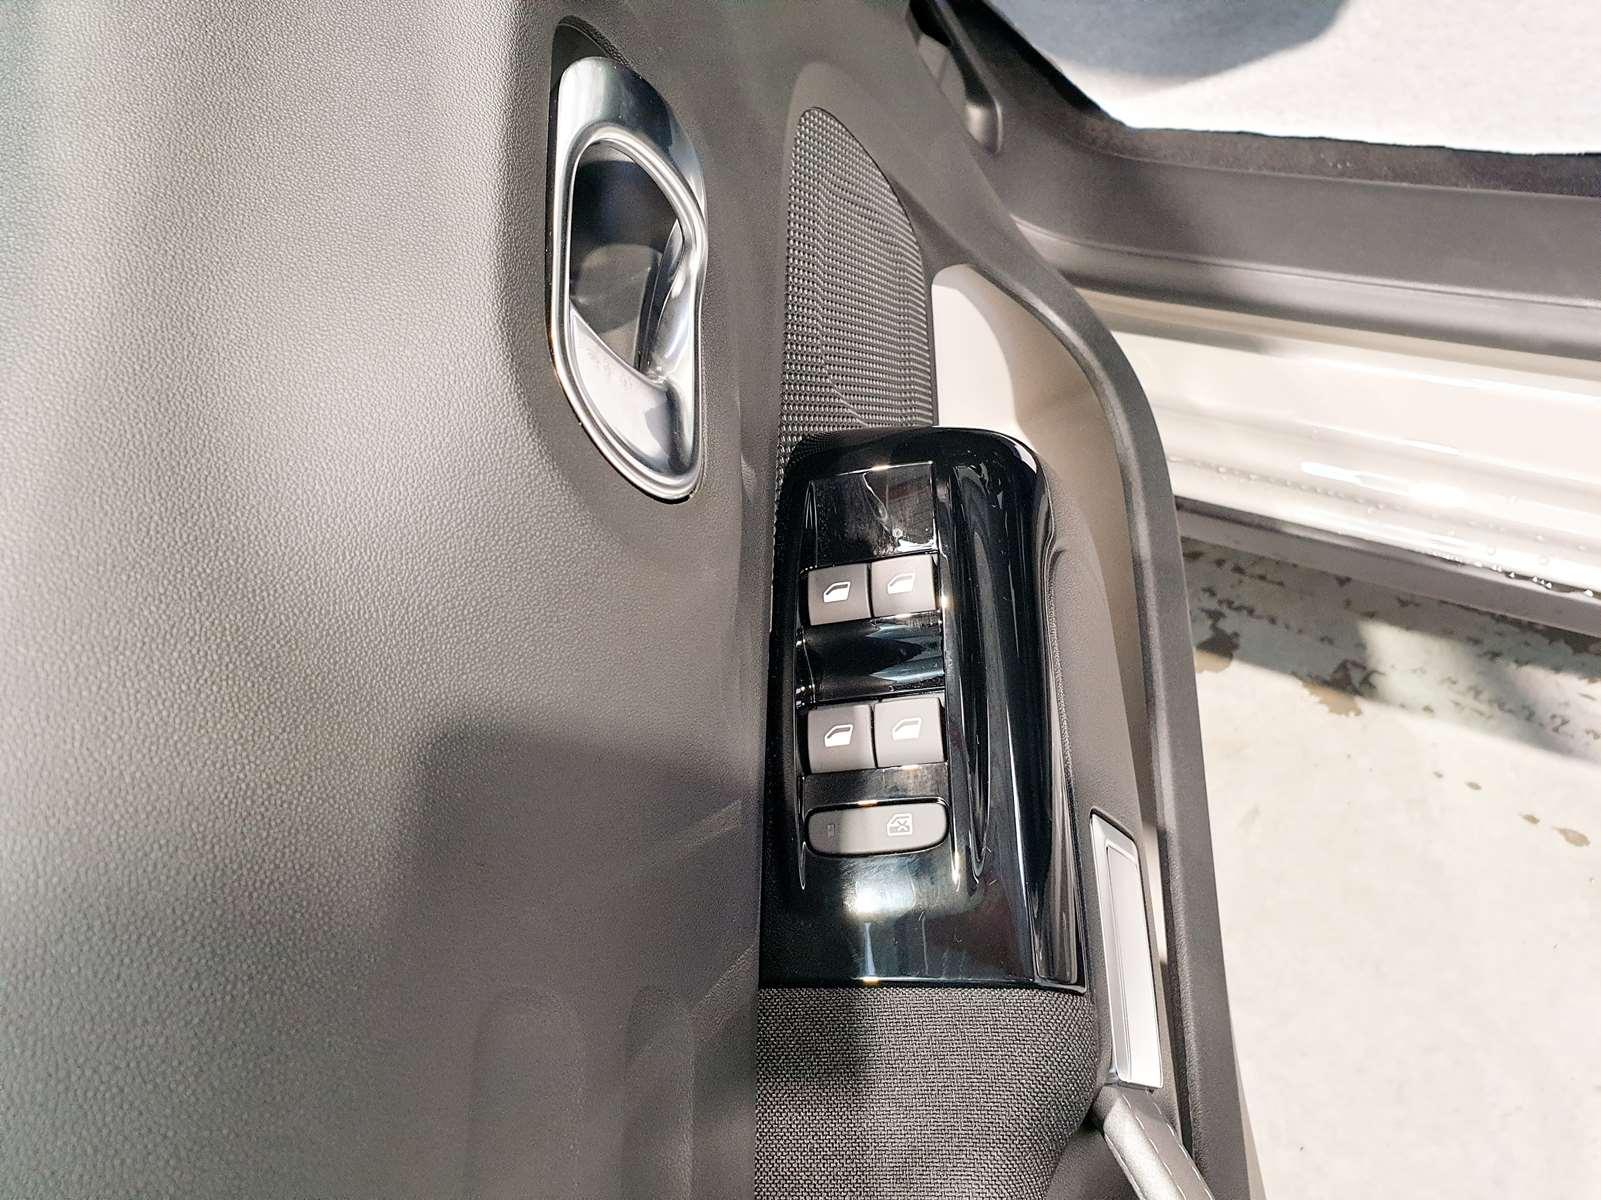 Miniature CITROEN C3 PureTech 82 S&S BVM5 Shine CAMERA